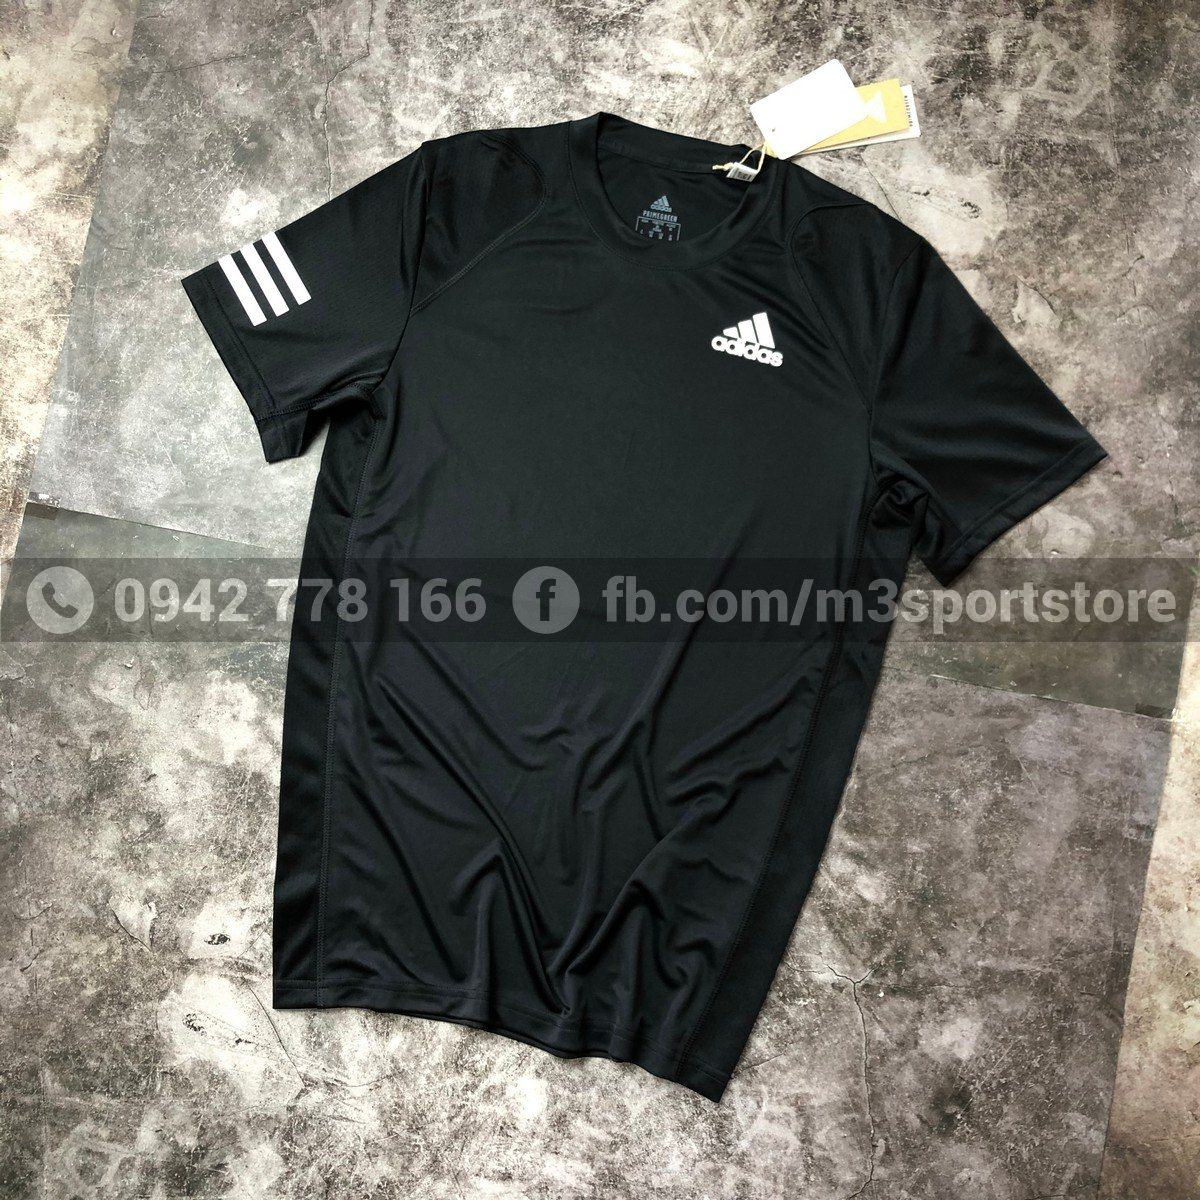 Áo thể thao nam Adidas Club 3 Stripe  GL5403